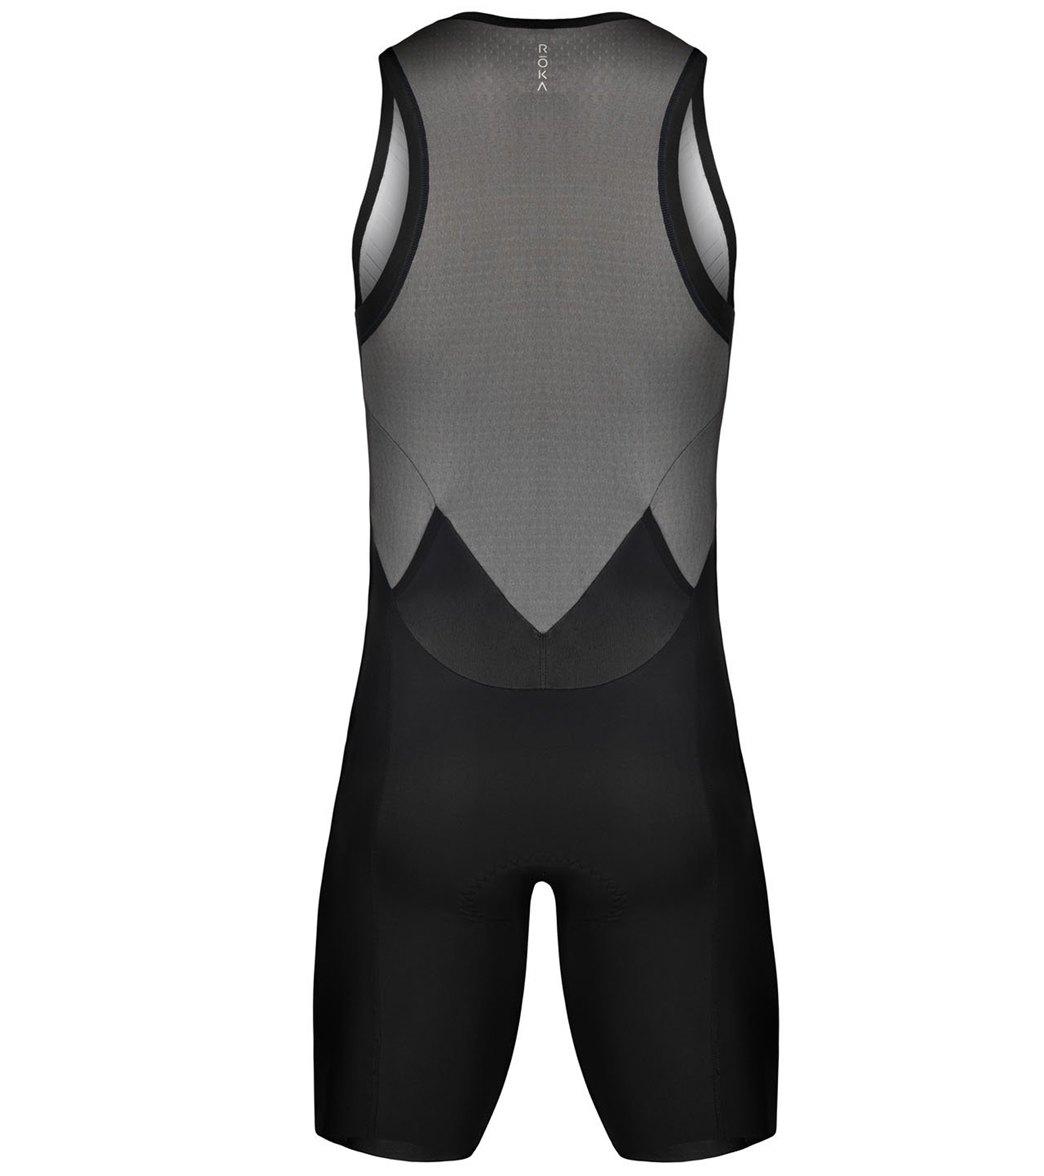 d112cc09c37 ROKA Men s Elite Aero II Sleeveless Tri Suit at SwimOutlet.com ...